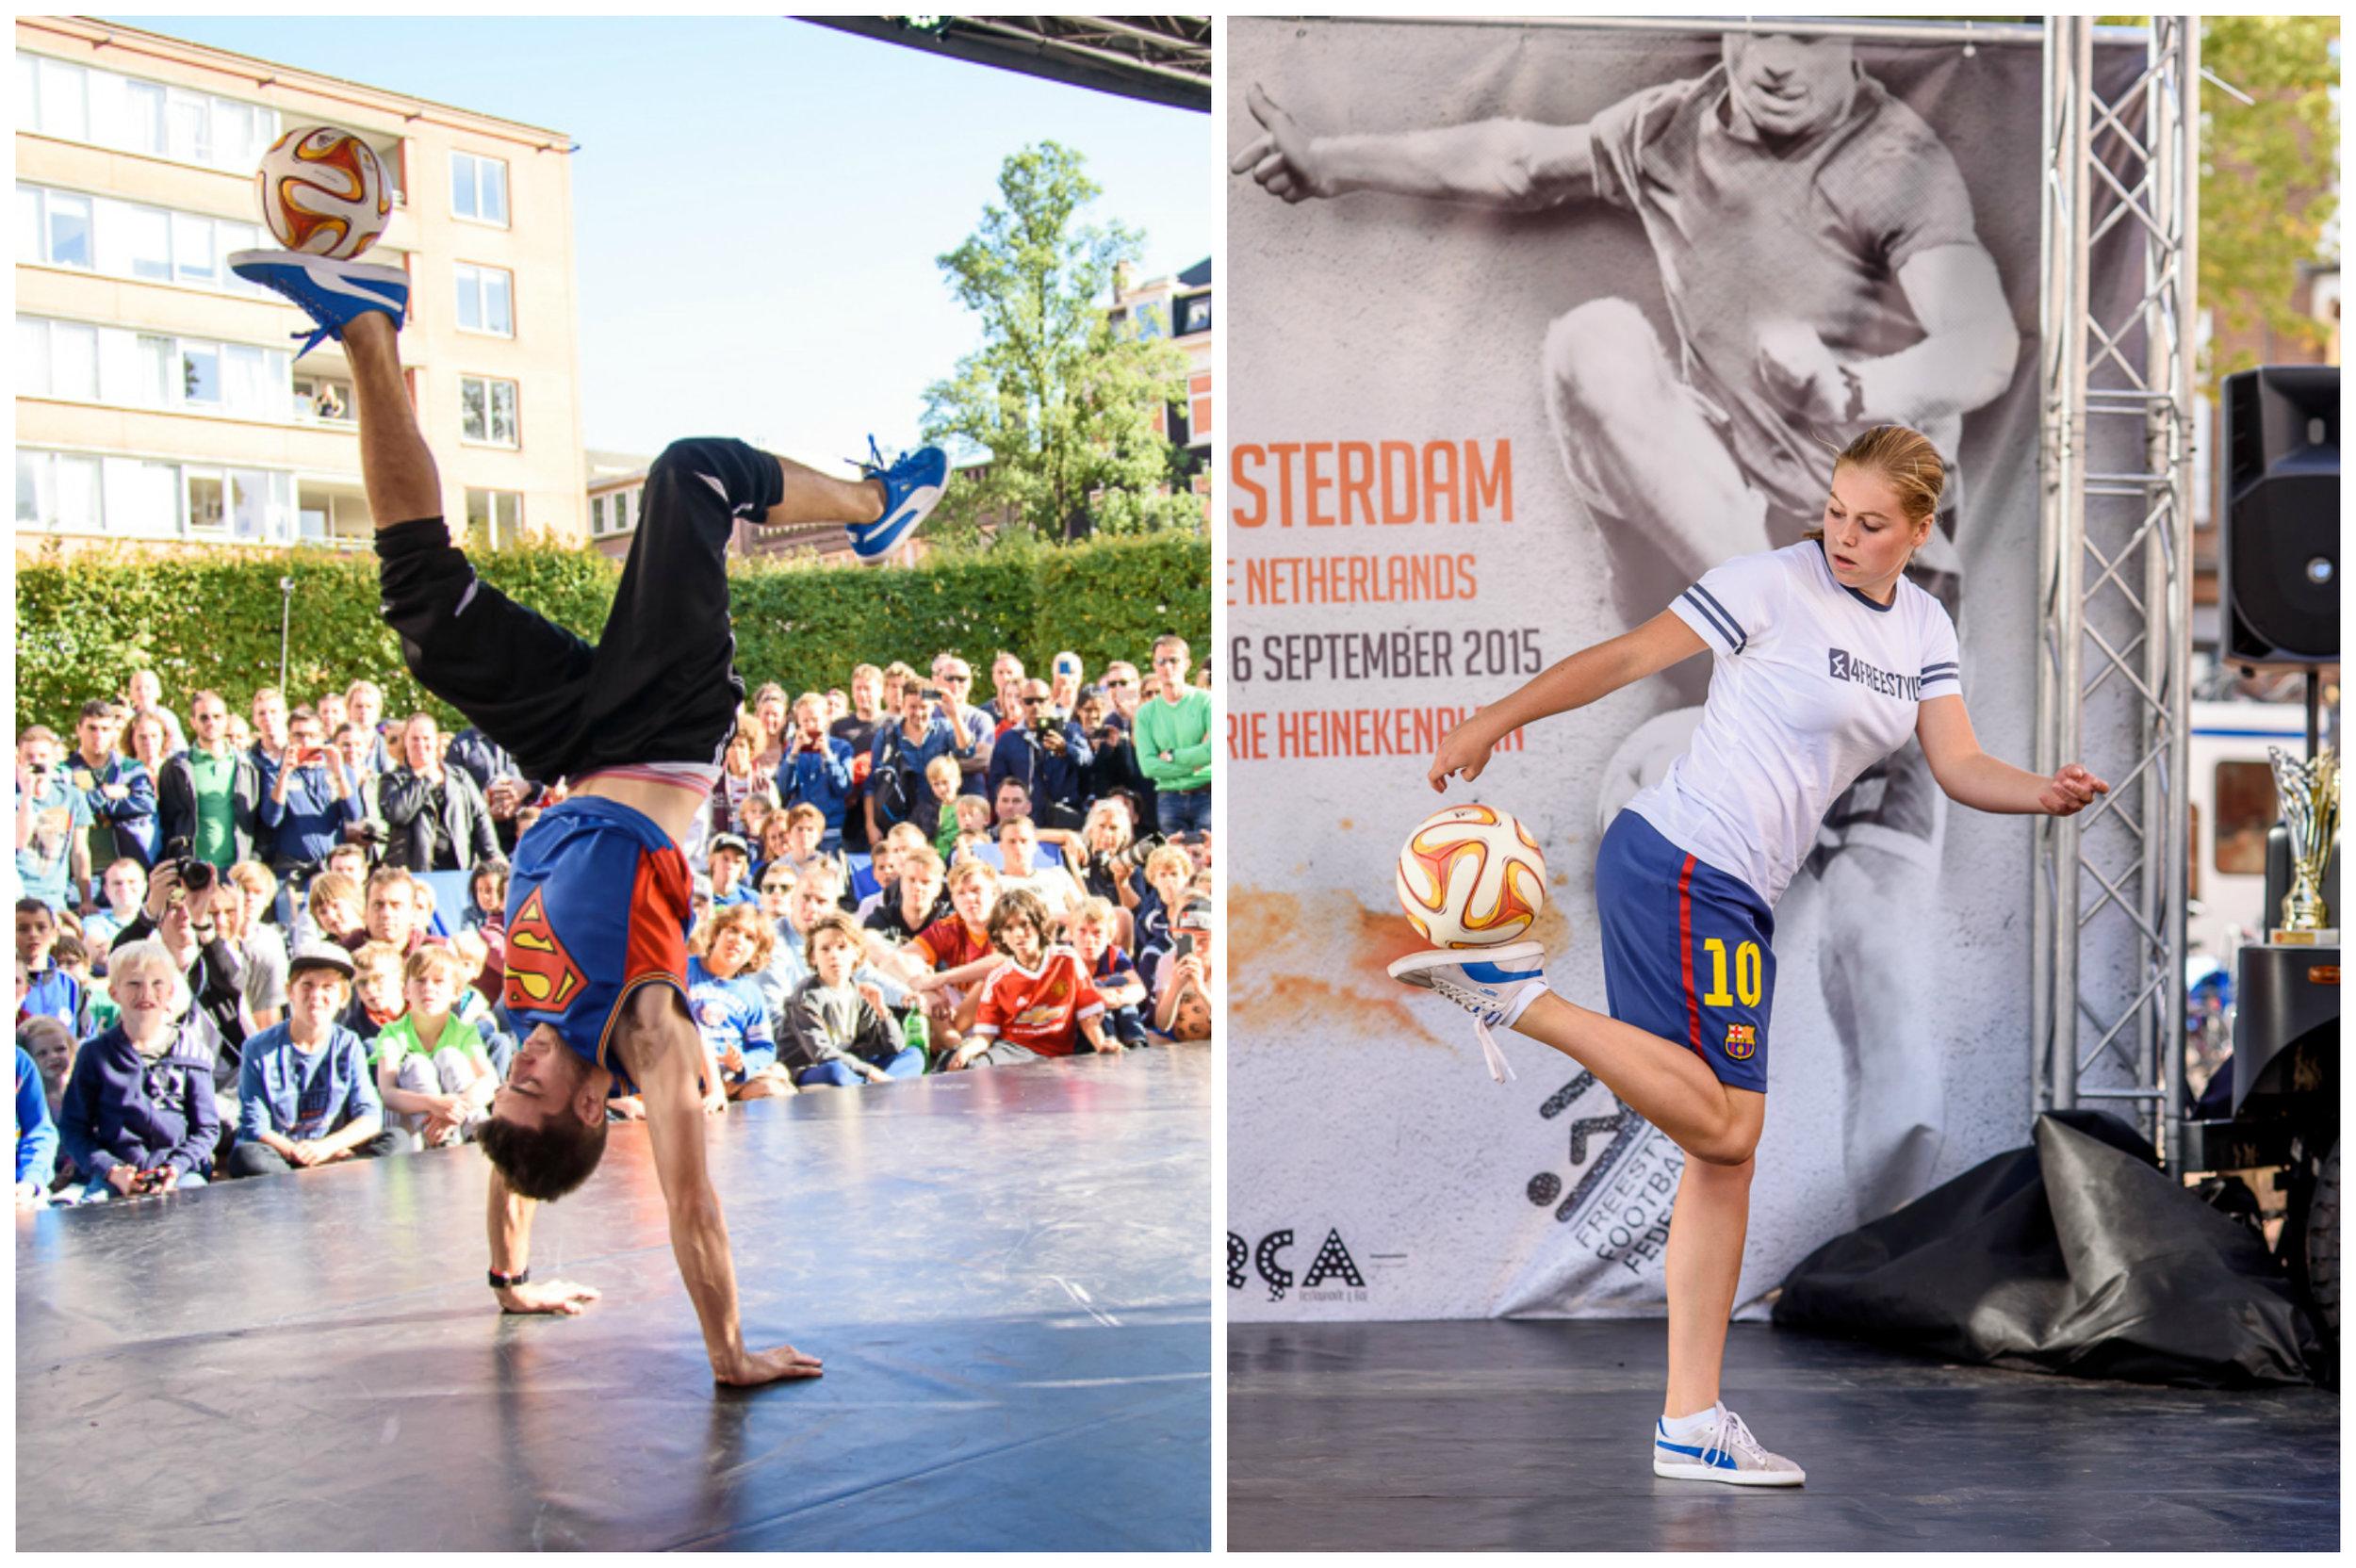 European Freestyle Football Championship - 2e plaats Maarten van Luit3e plaats dames Jasmijn Janssen